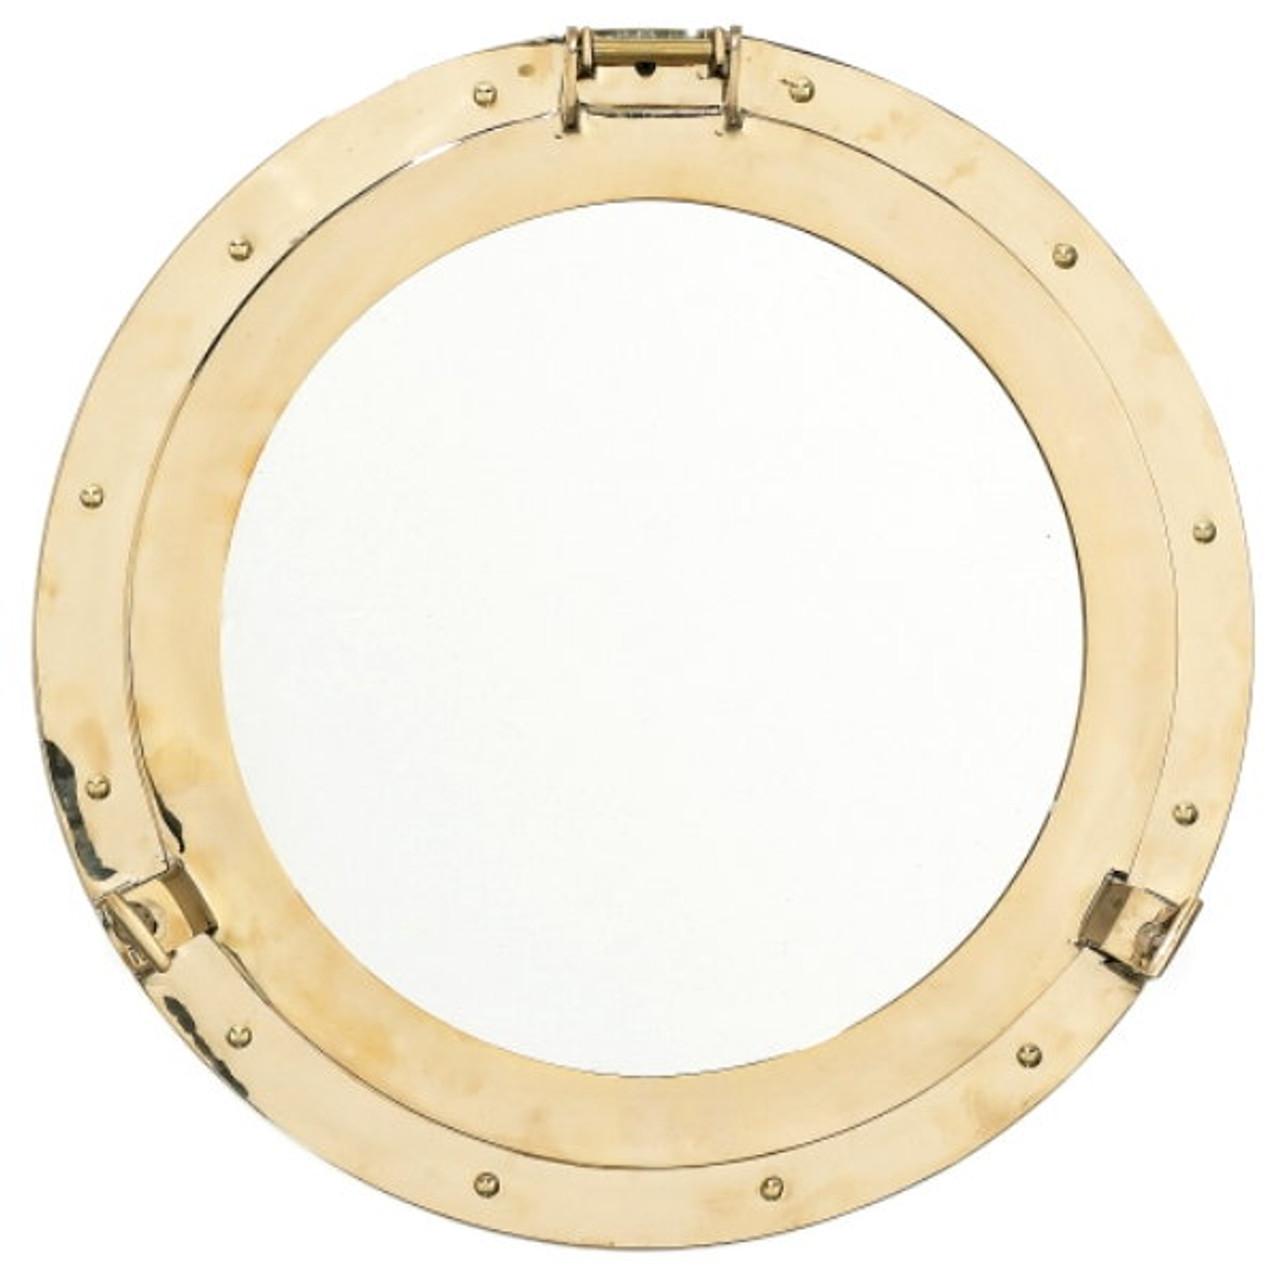 Home Decor Items Batela Brass Porthole Accent Mirror 20 Cm D Home Furniture Diy Tohoku Morinagamilk Co Jp